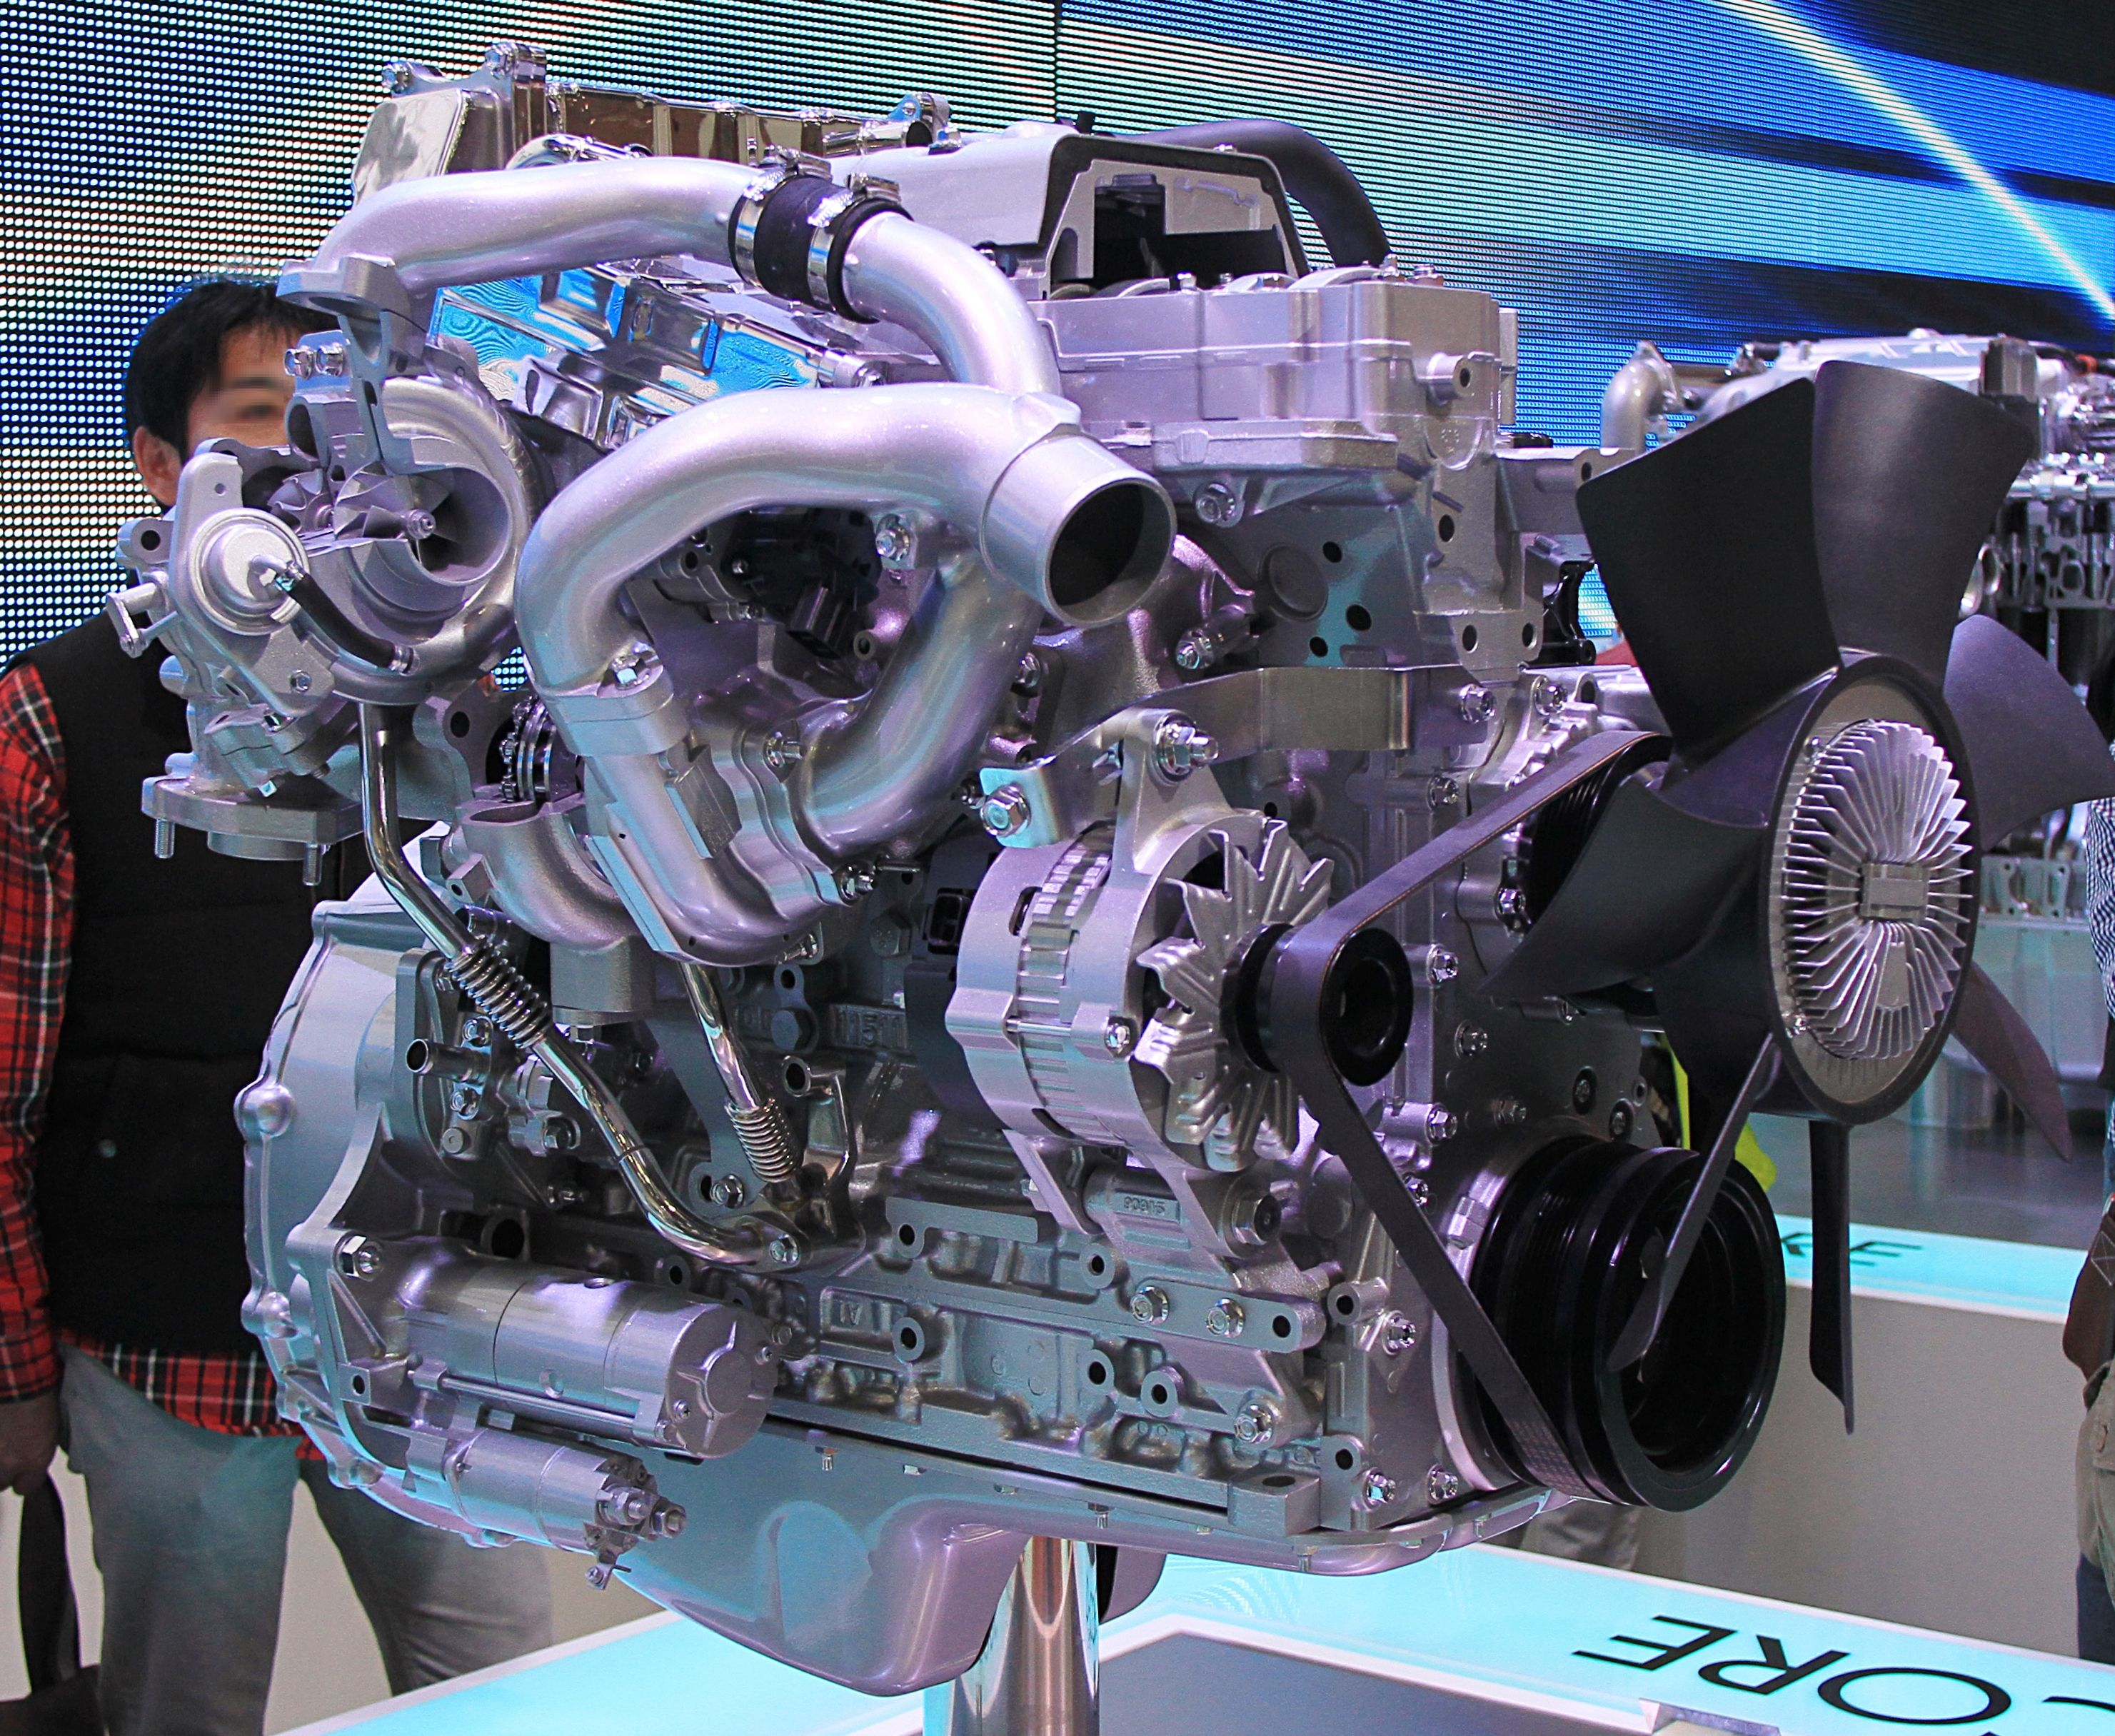 File:Isuzu 4HK1-TCH engine jpg - Wikimedia Commons